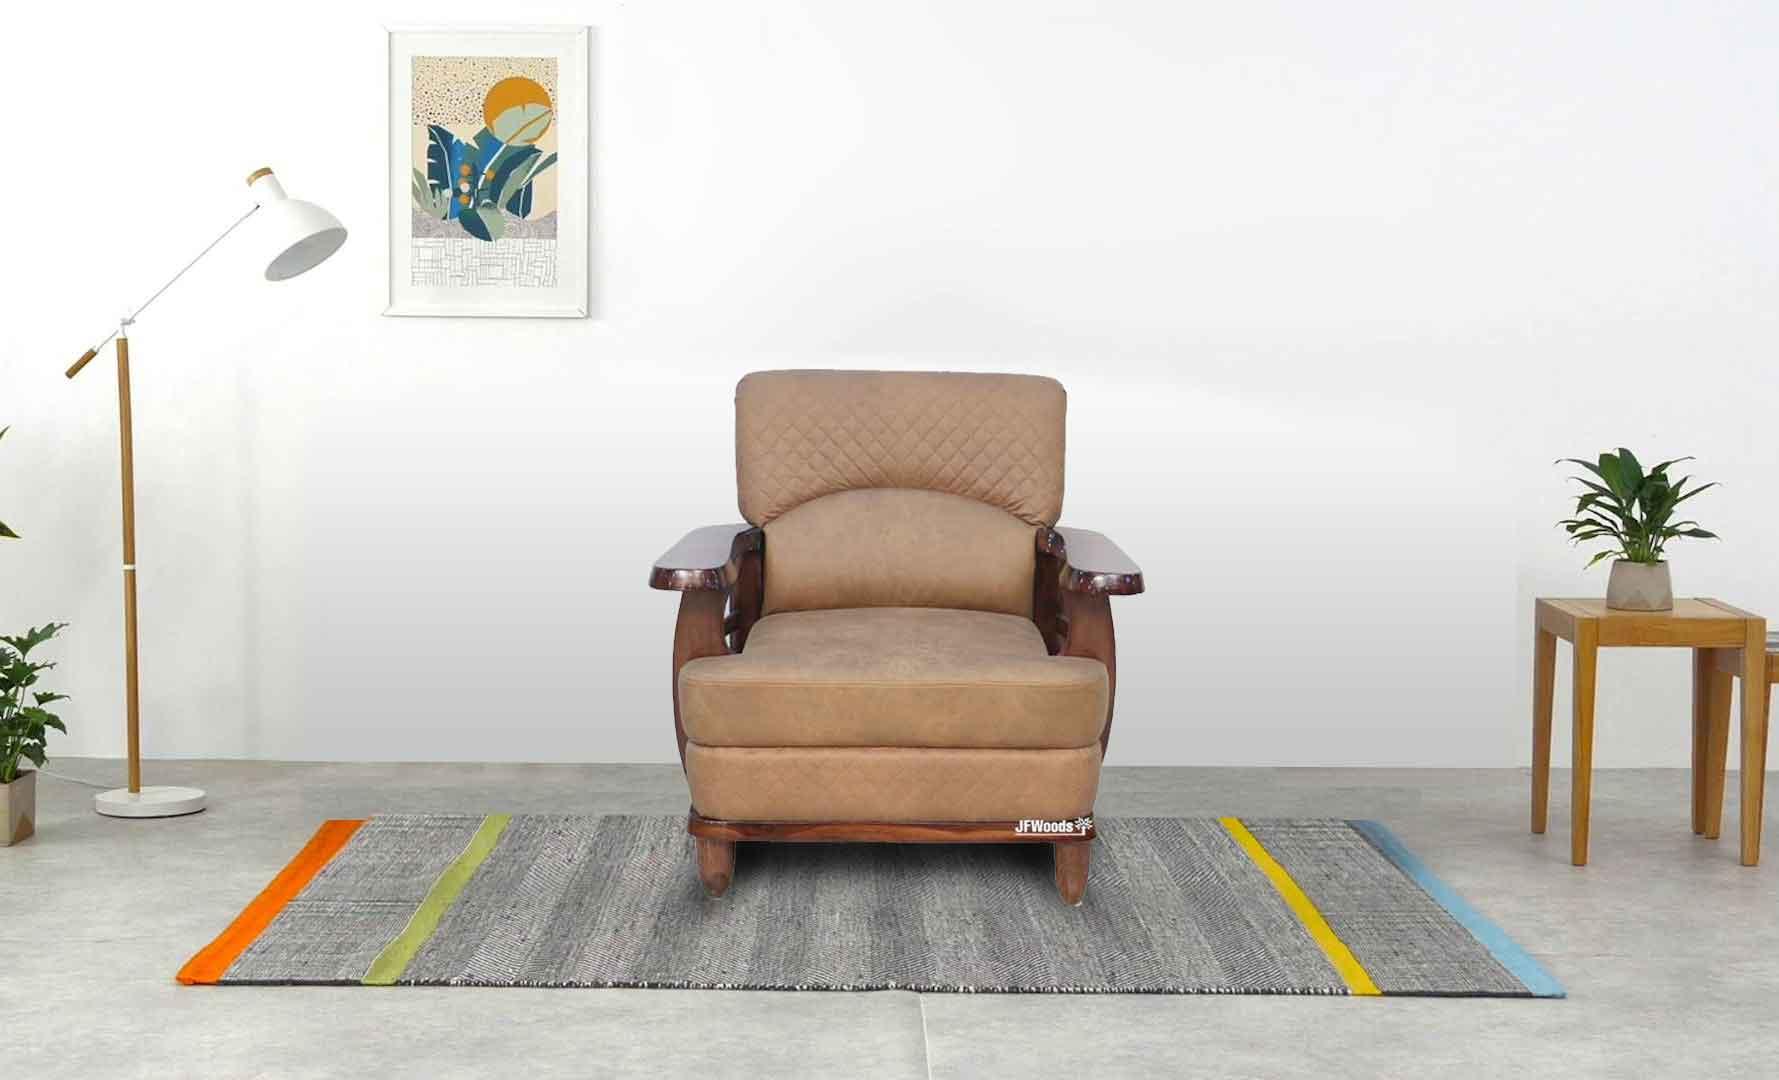 Oscar One Seater Teak Wood Sofa By Jfwoods